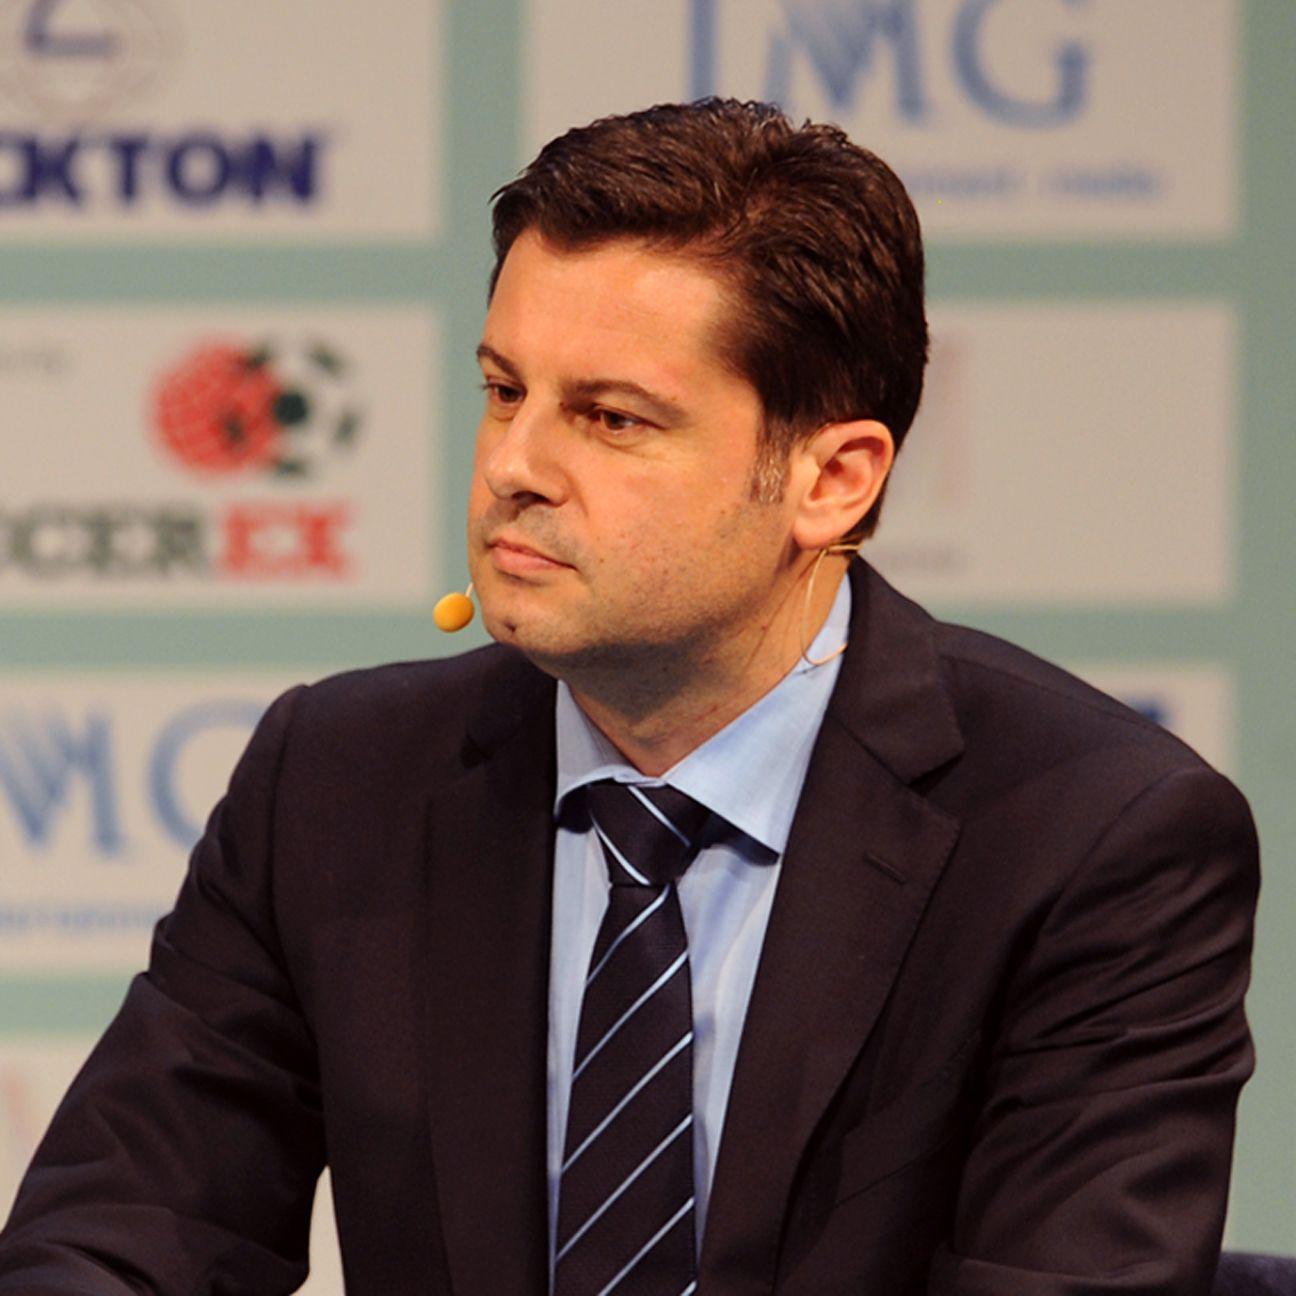 Bundesliga CEO Christian Seifert speaks to club representatives.